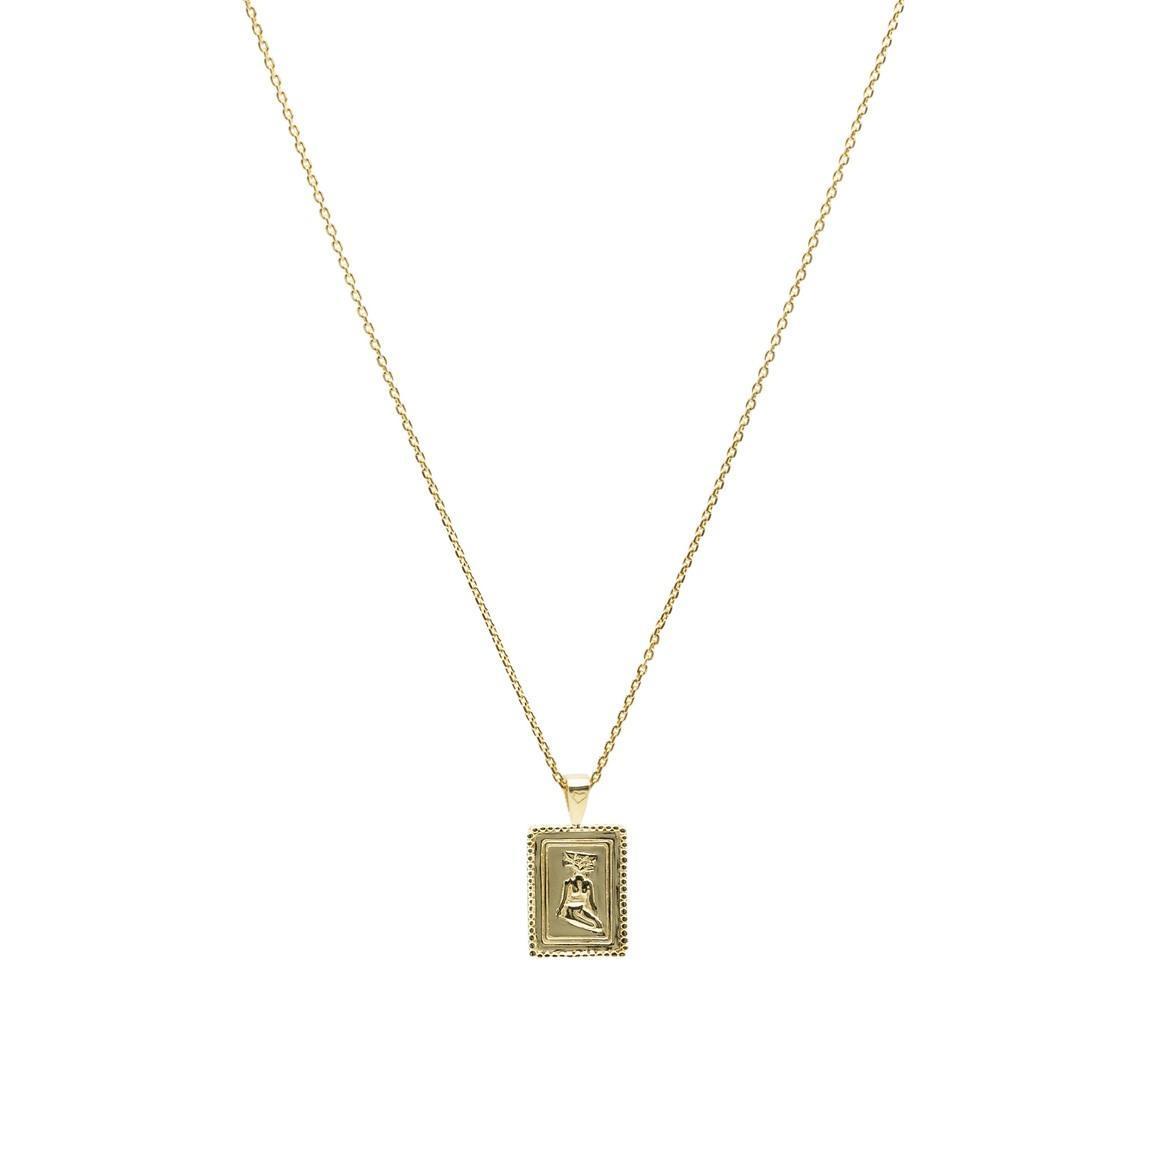 Sumii Necklace | Trada Marketplace